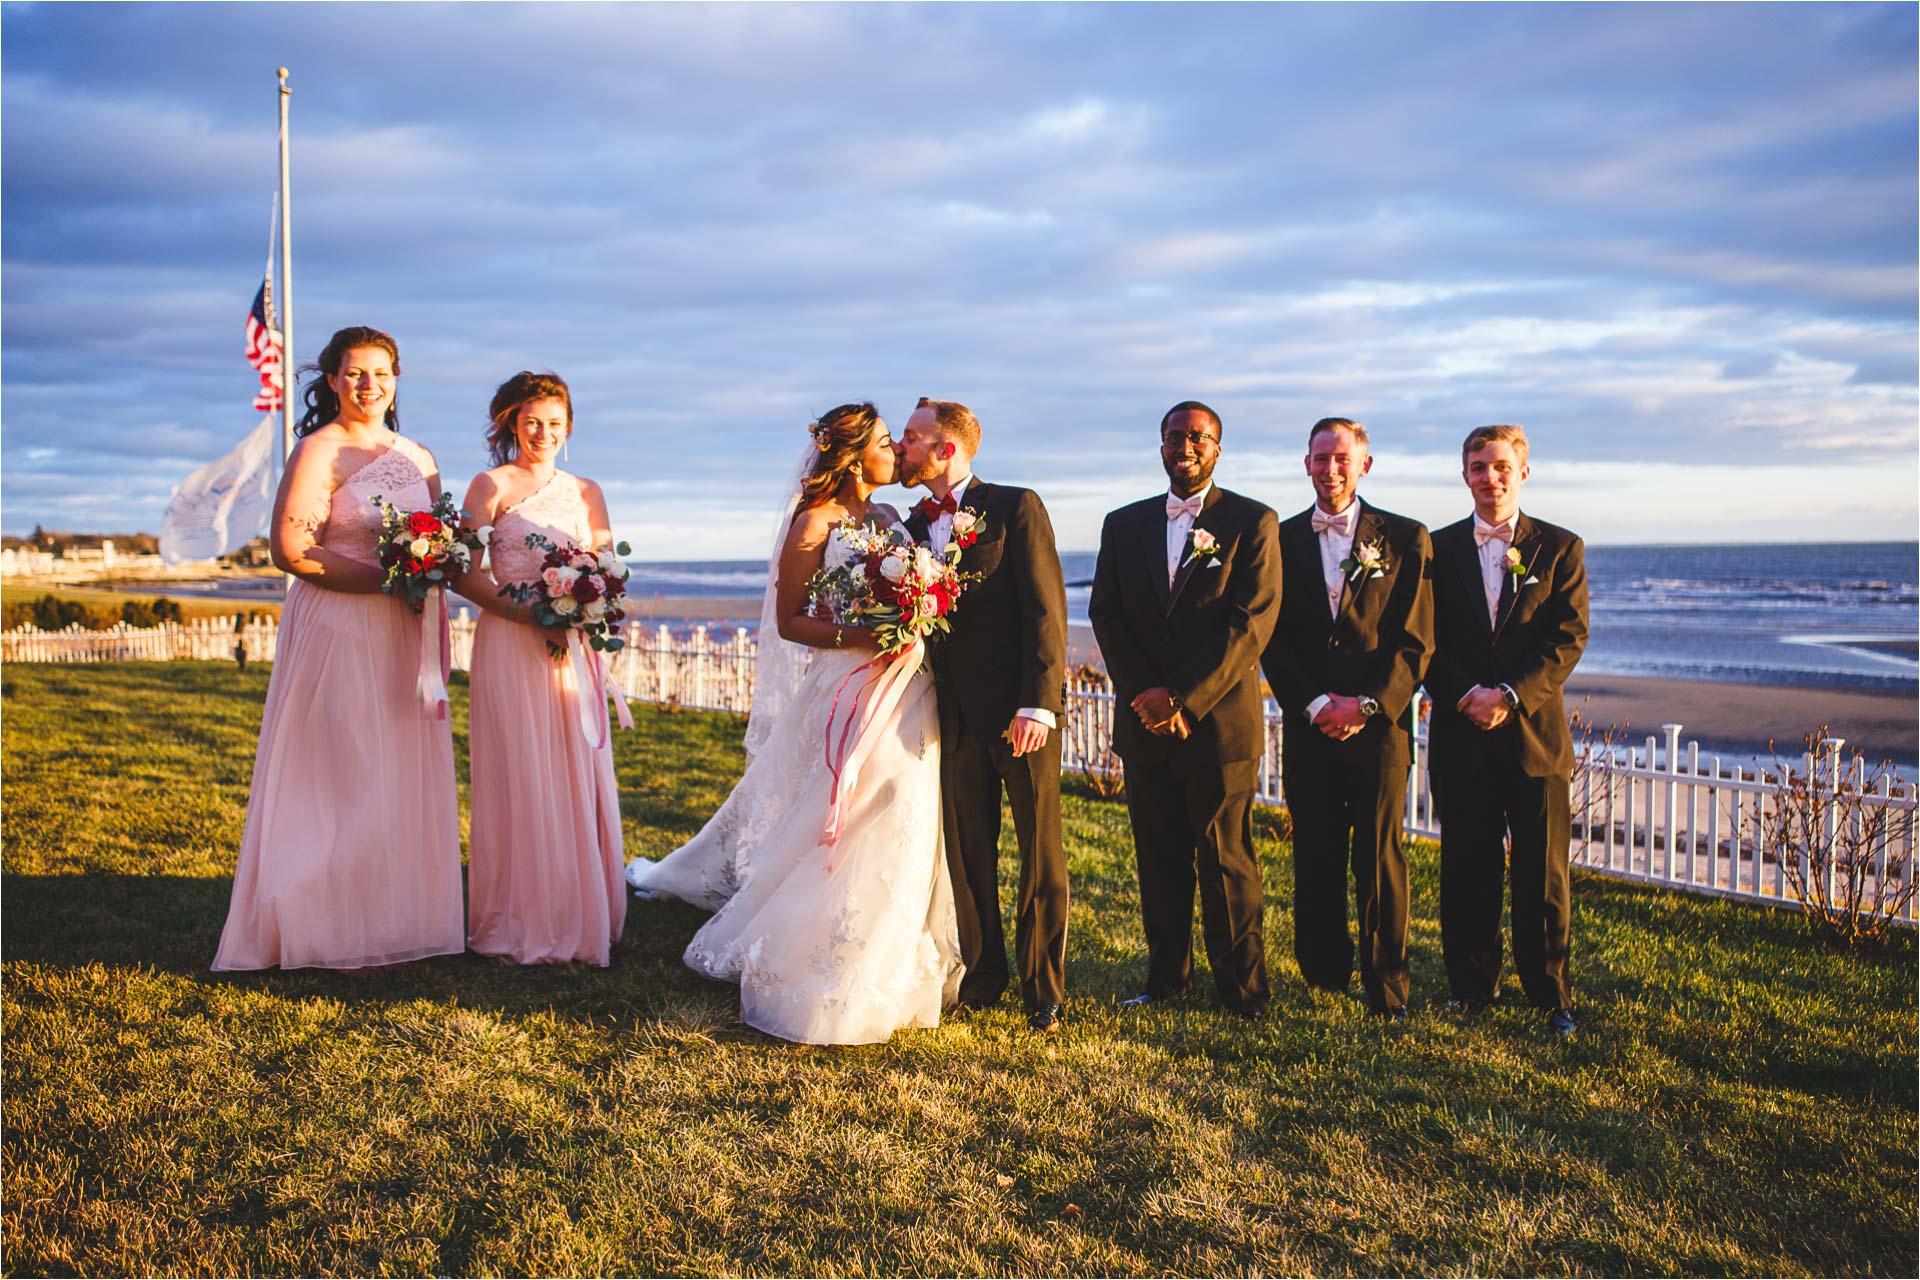 Waters-Edge-Westbrook-Wedding-Photography-CT-23.jpg